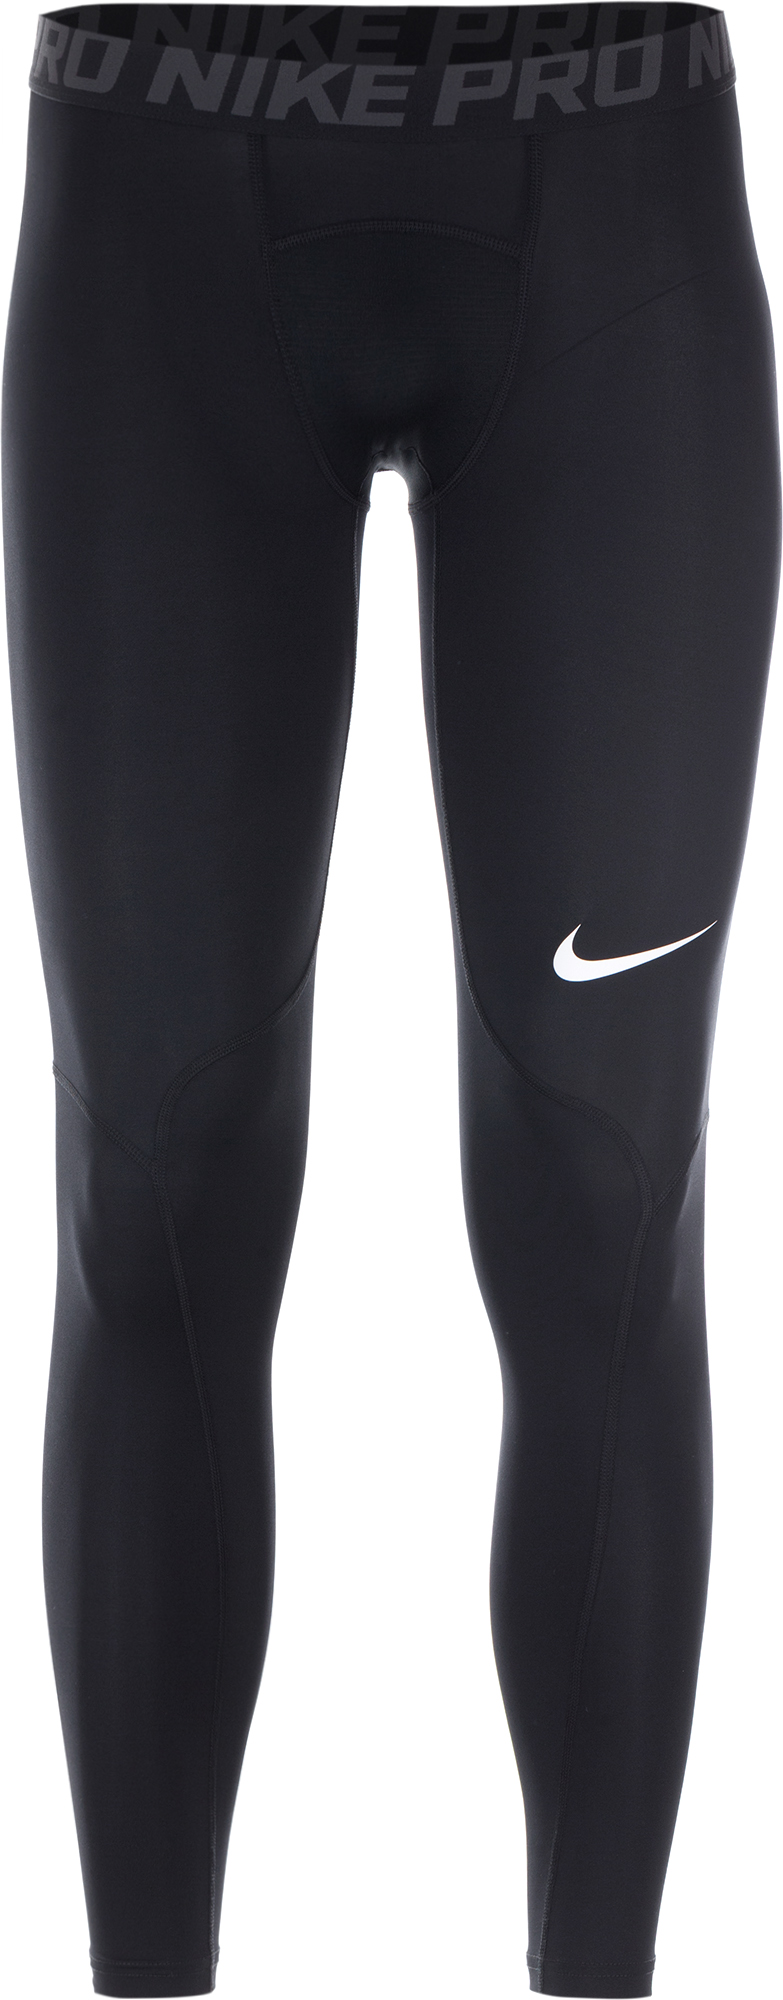 Nike Тайтсы мужские Nike Pro, размер 52-54